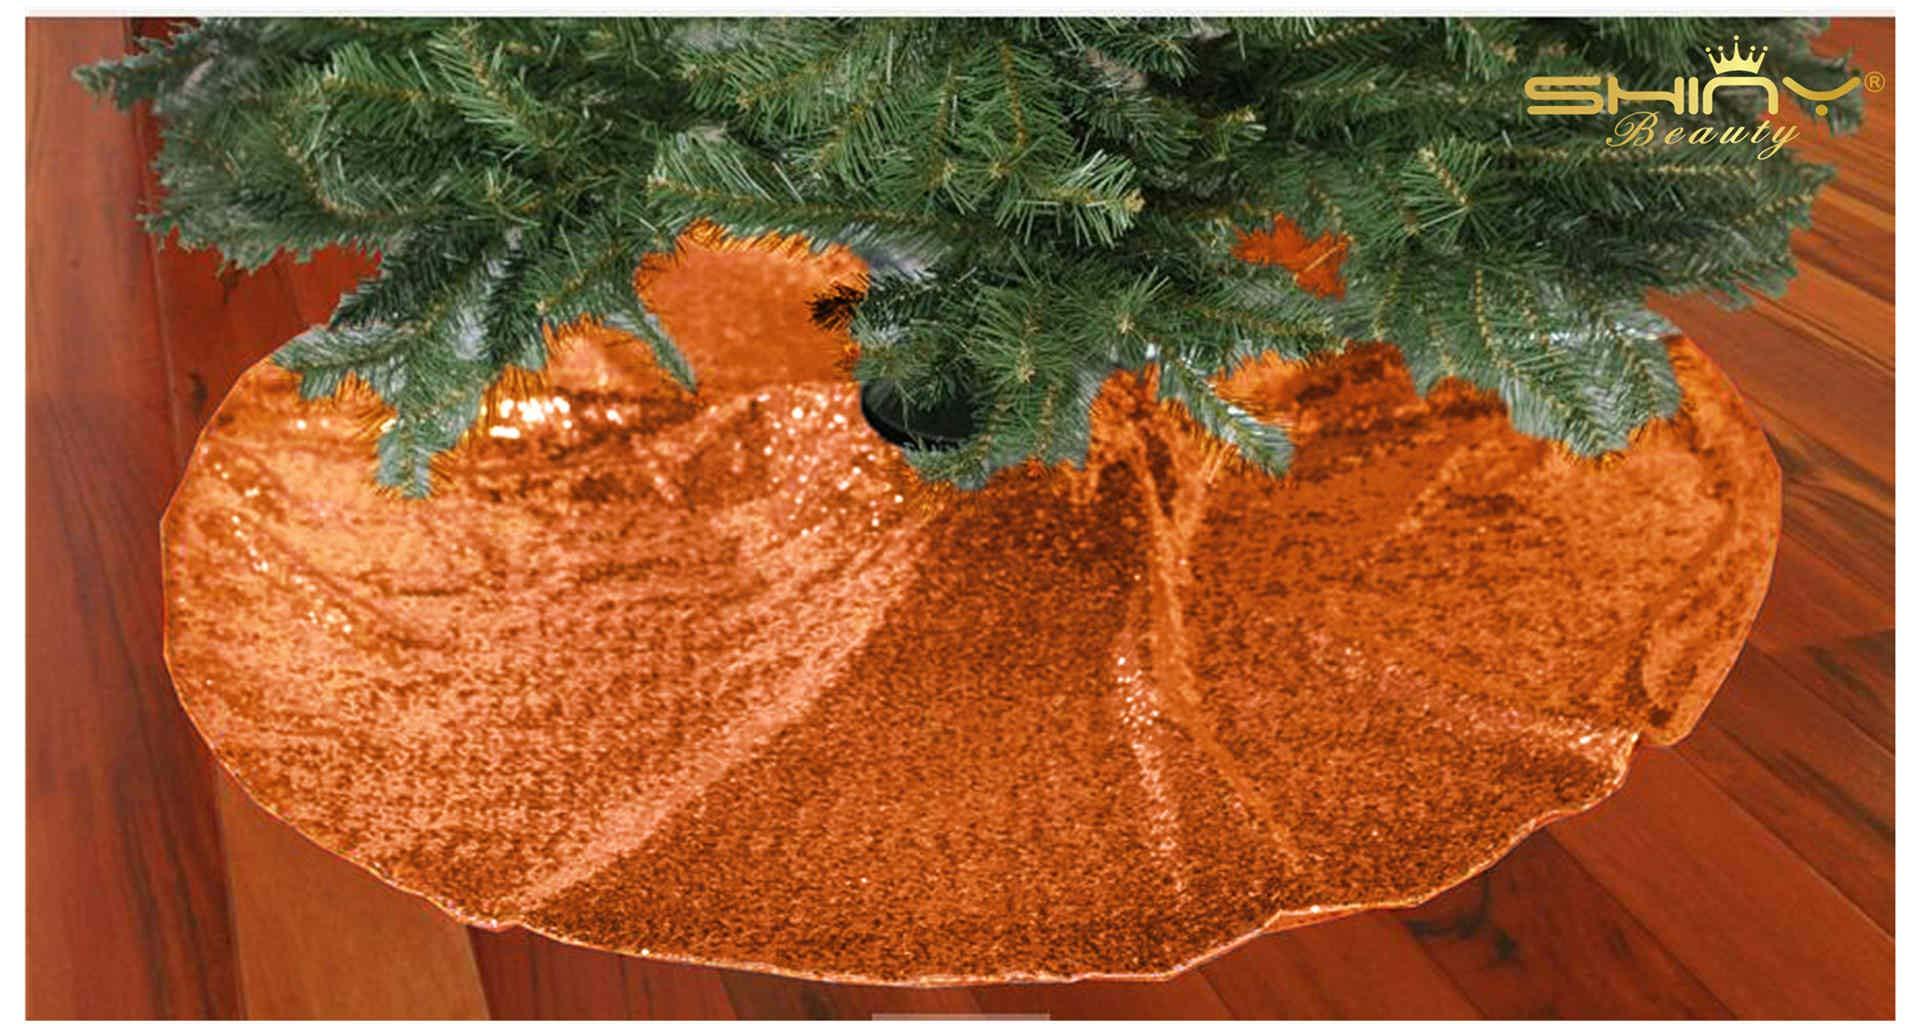 ShinyBeauty 48-Inch Embroidery Sequin Christmas Tree Skirt, Orange